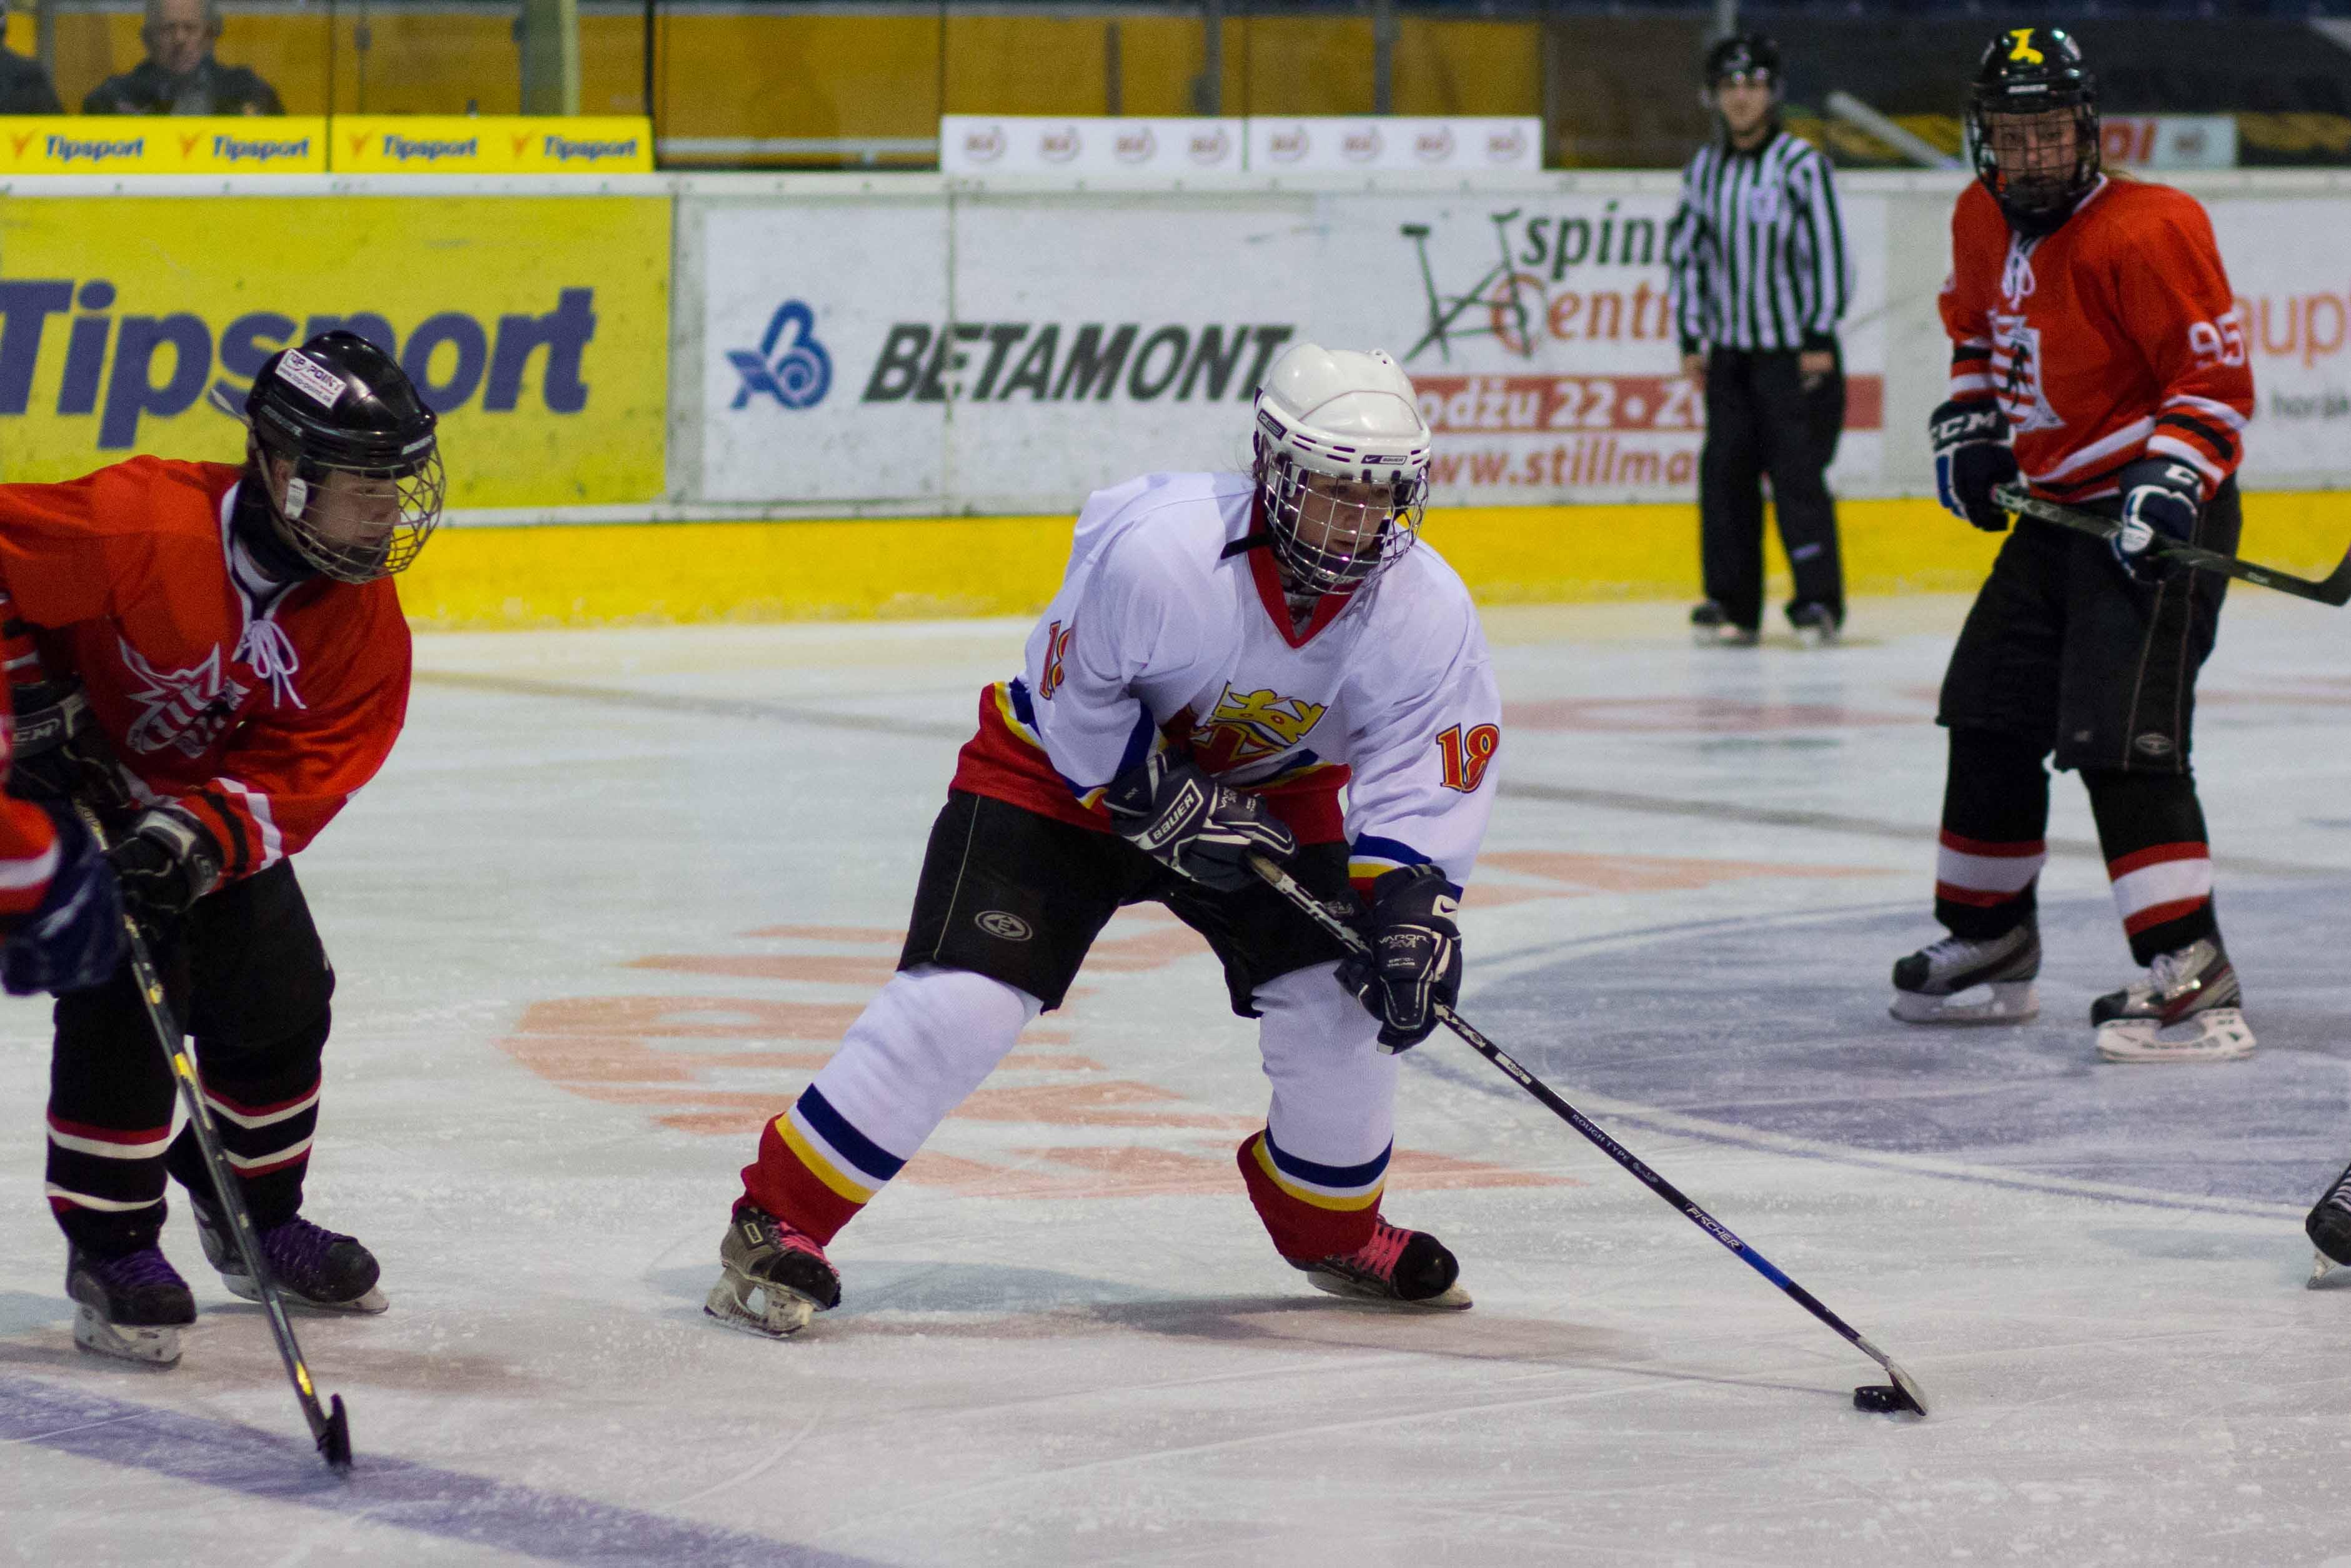 zhkm-zv-iskra-bb-2012-hokej-17